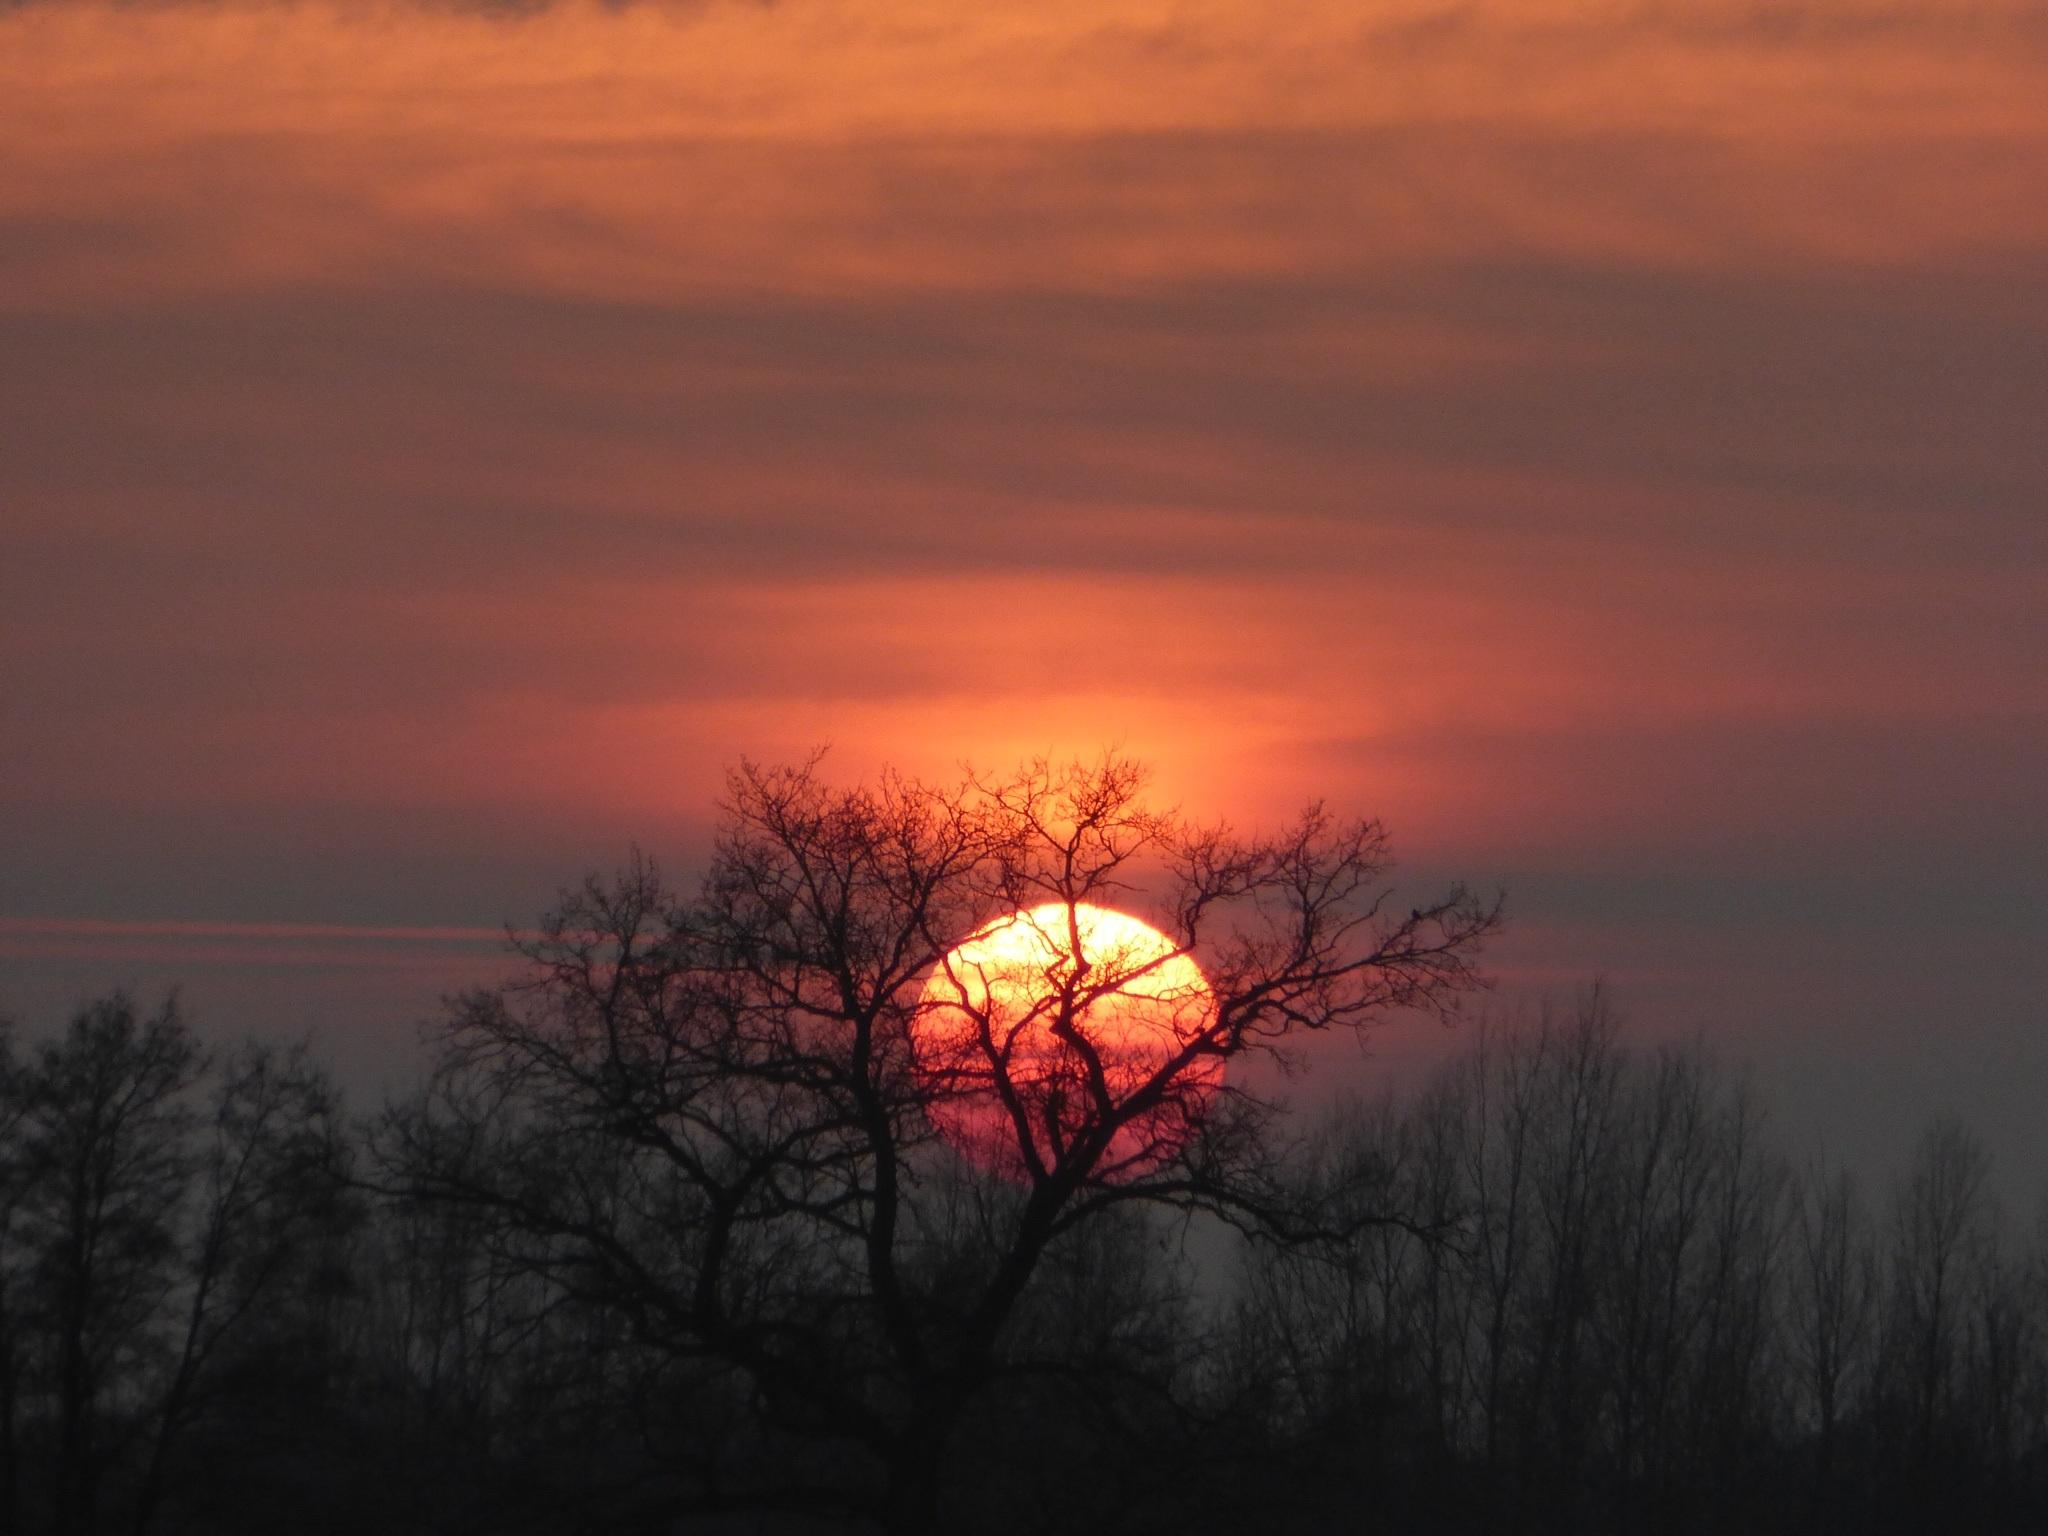 Gambar Pemandangan Alam Horison Awan Matahari Terbit